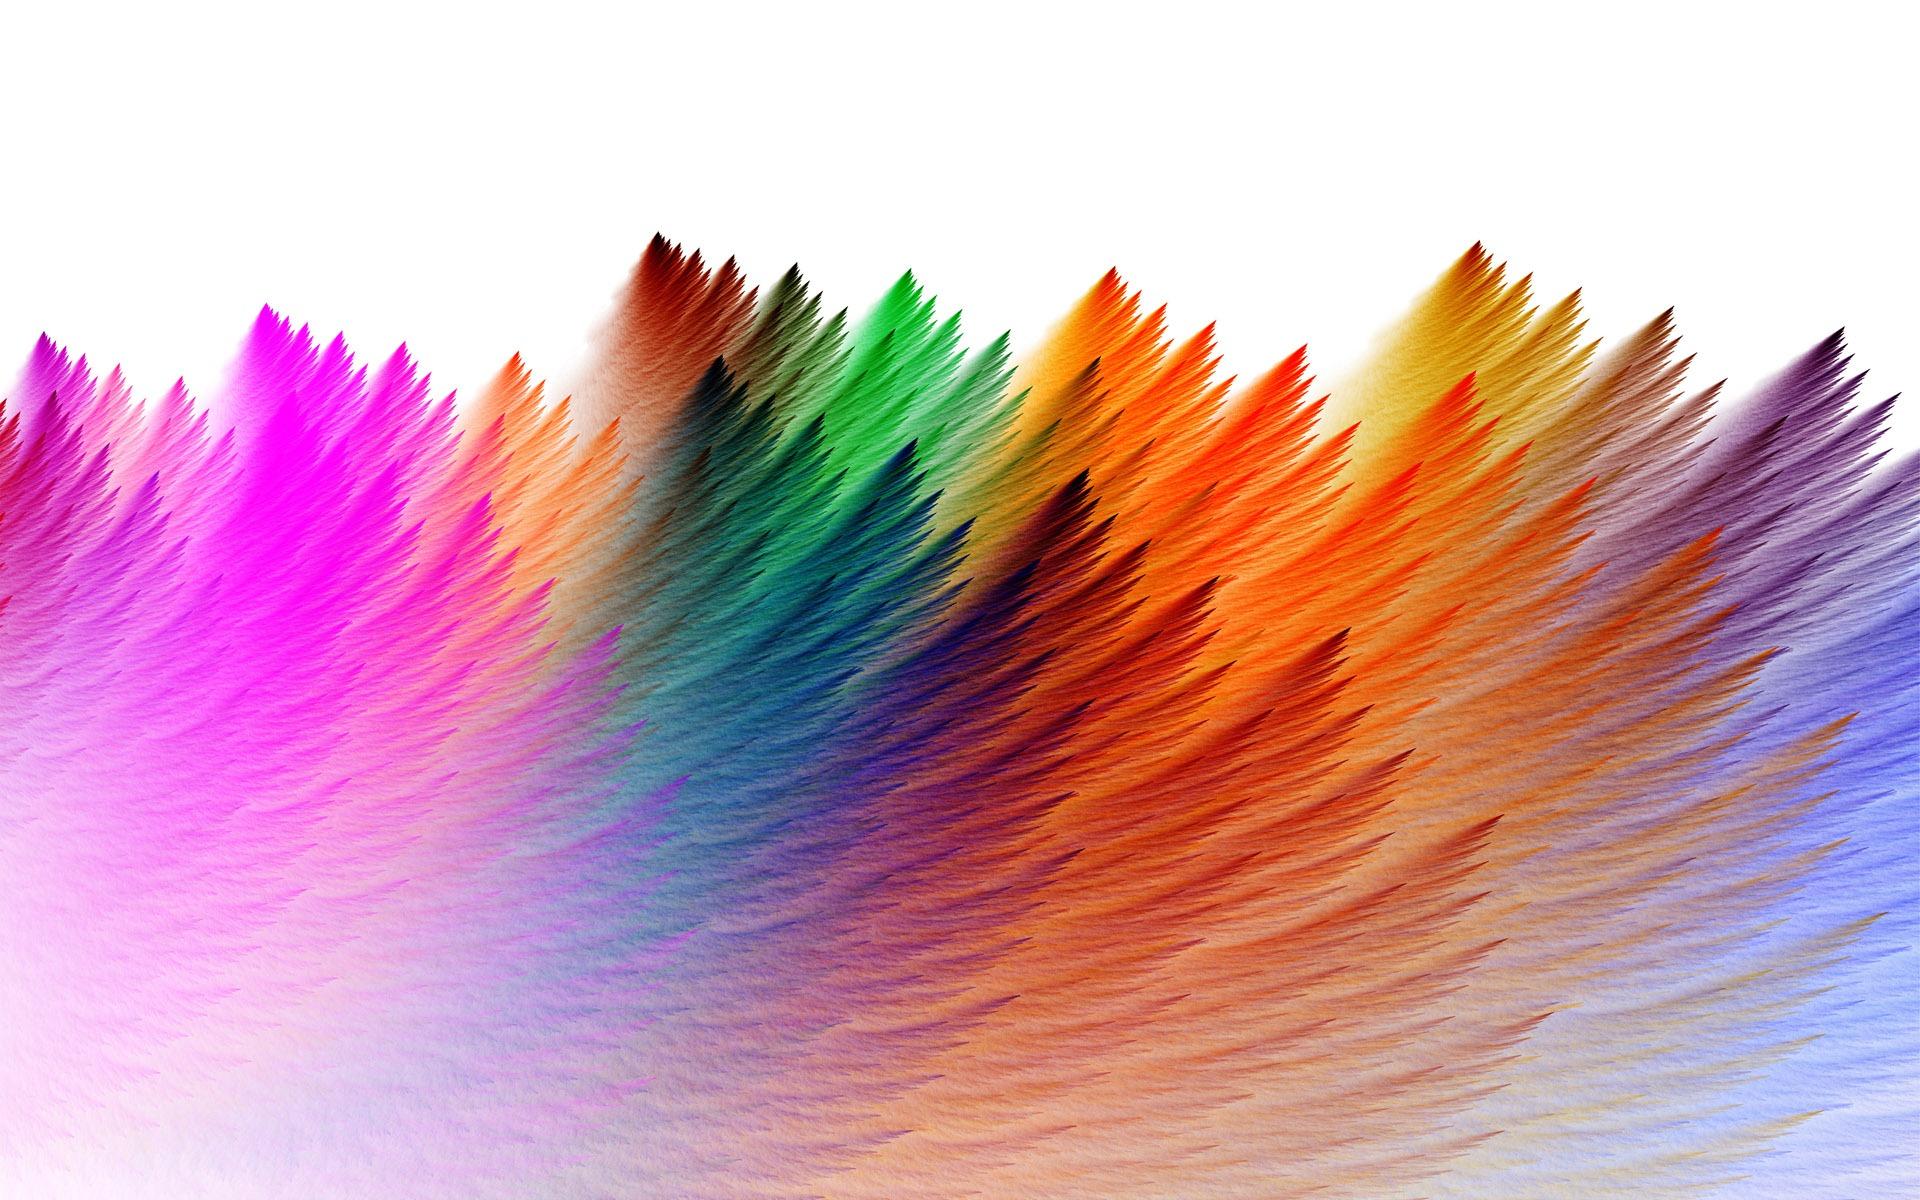 Bright Colorful Wallpaper 1 11 1920x1200 Wallpaper